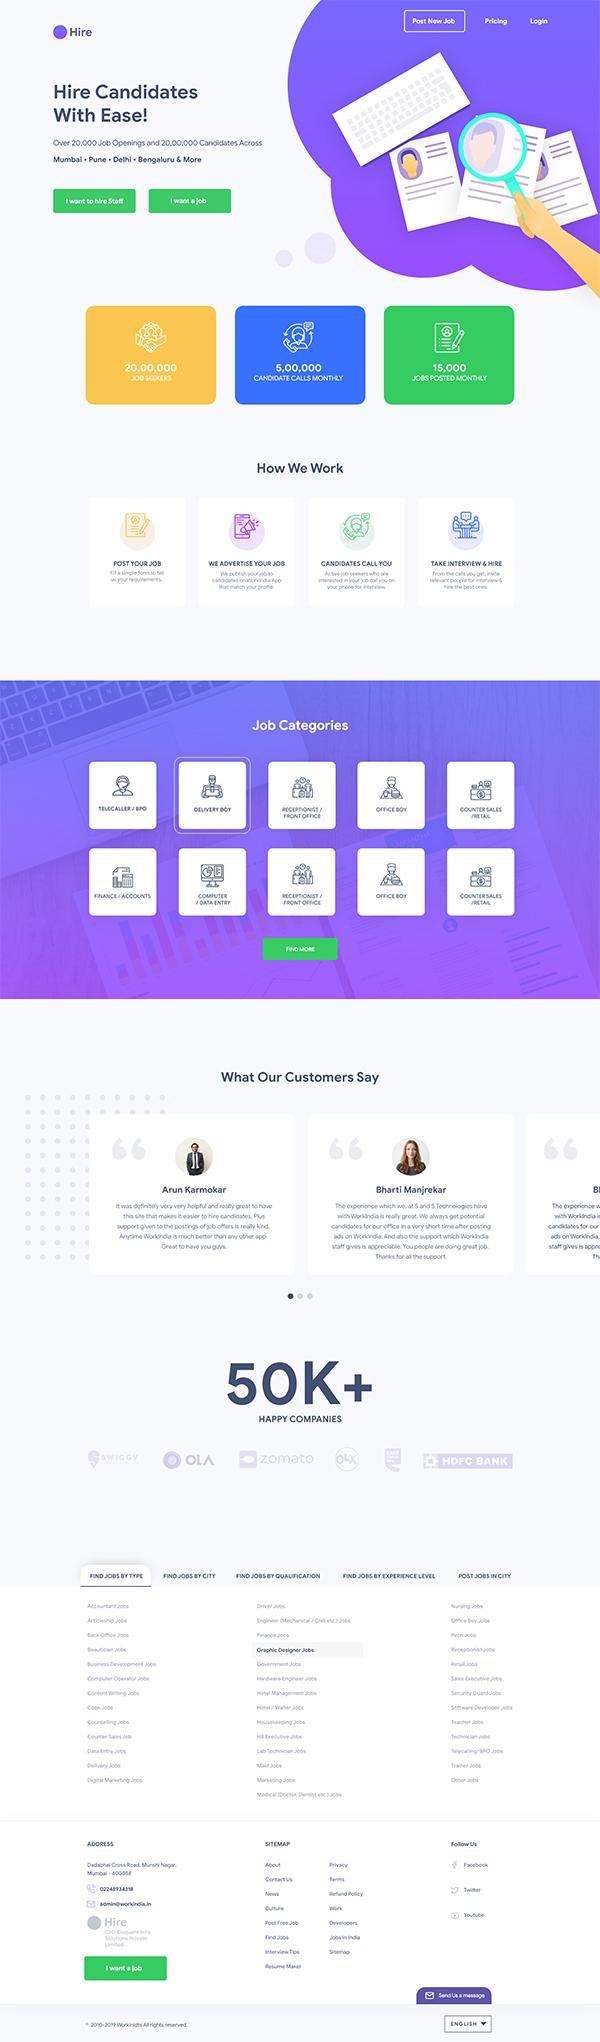 Free Job Portal Landing Page Template